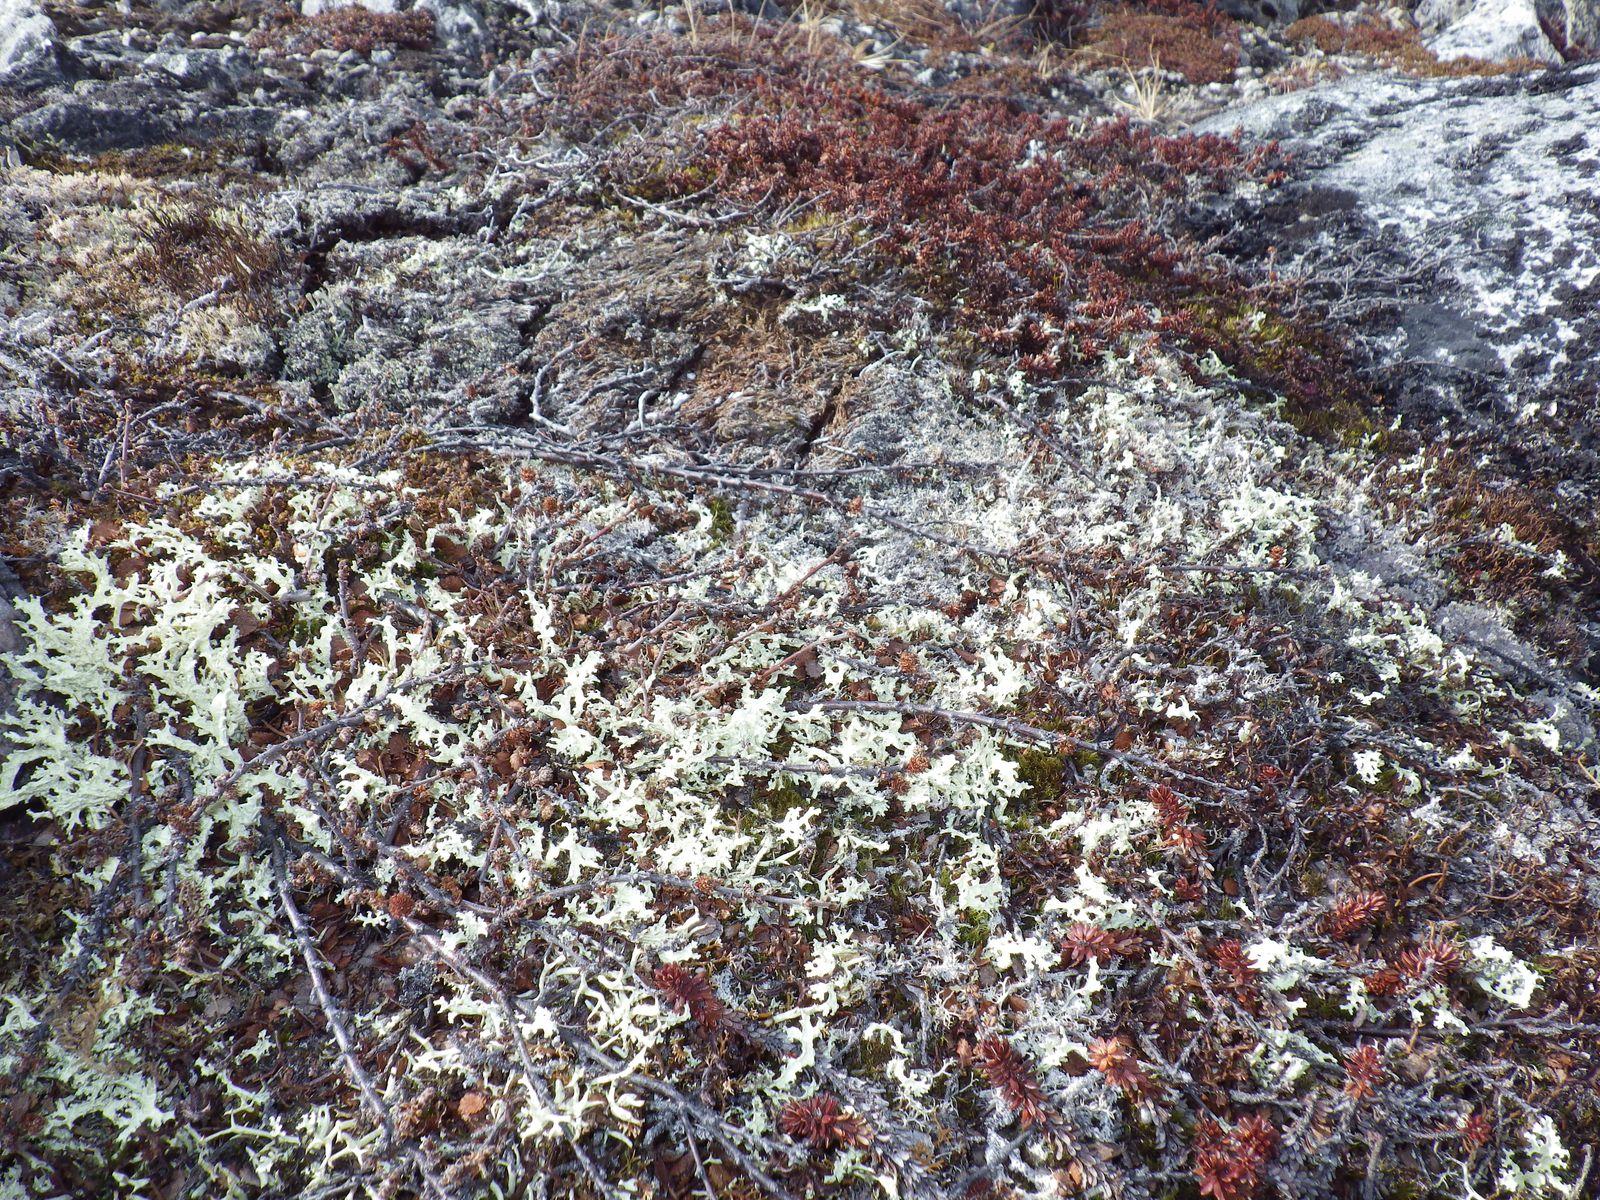 2013-04-17-1703_-_rensdyrlav_vegetation